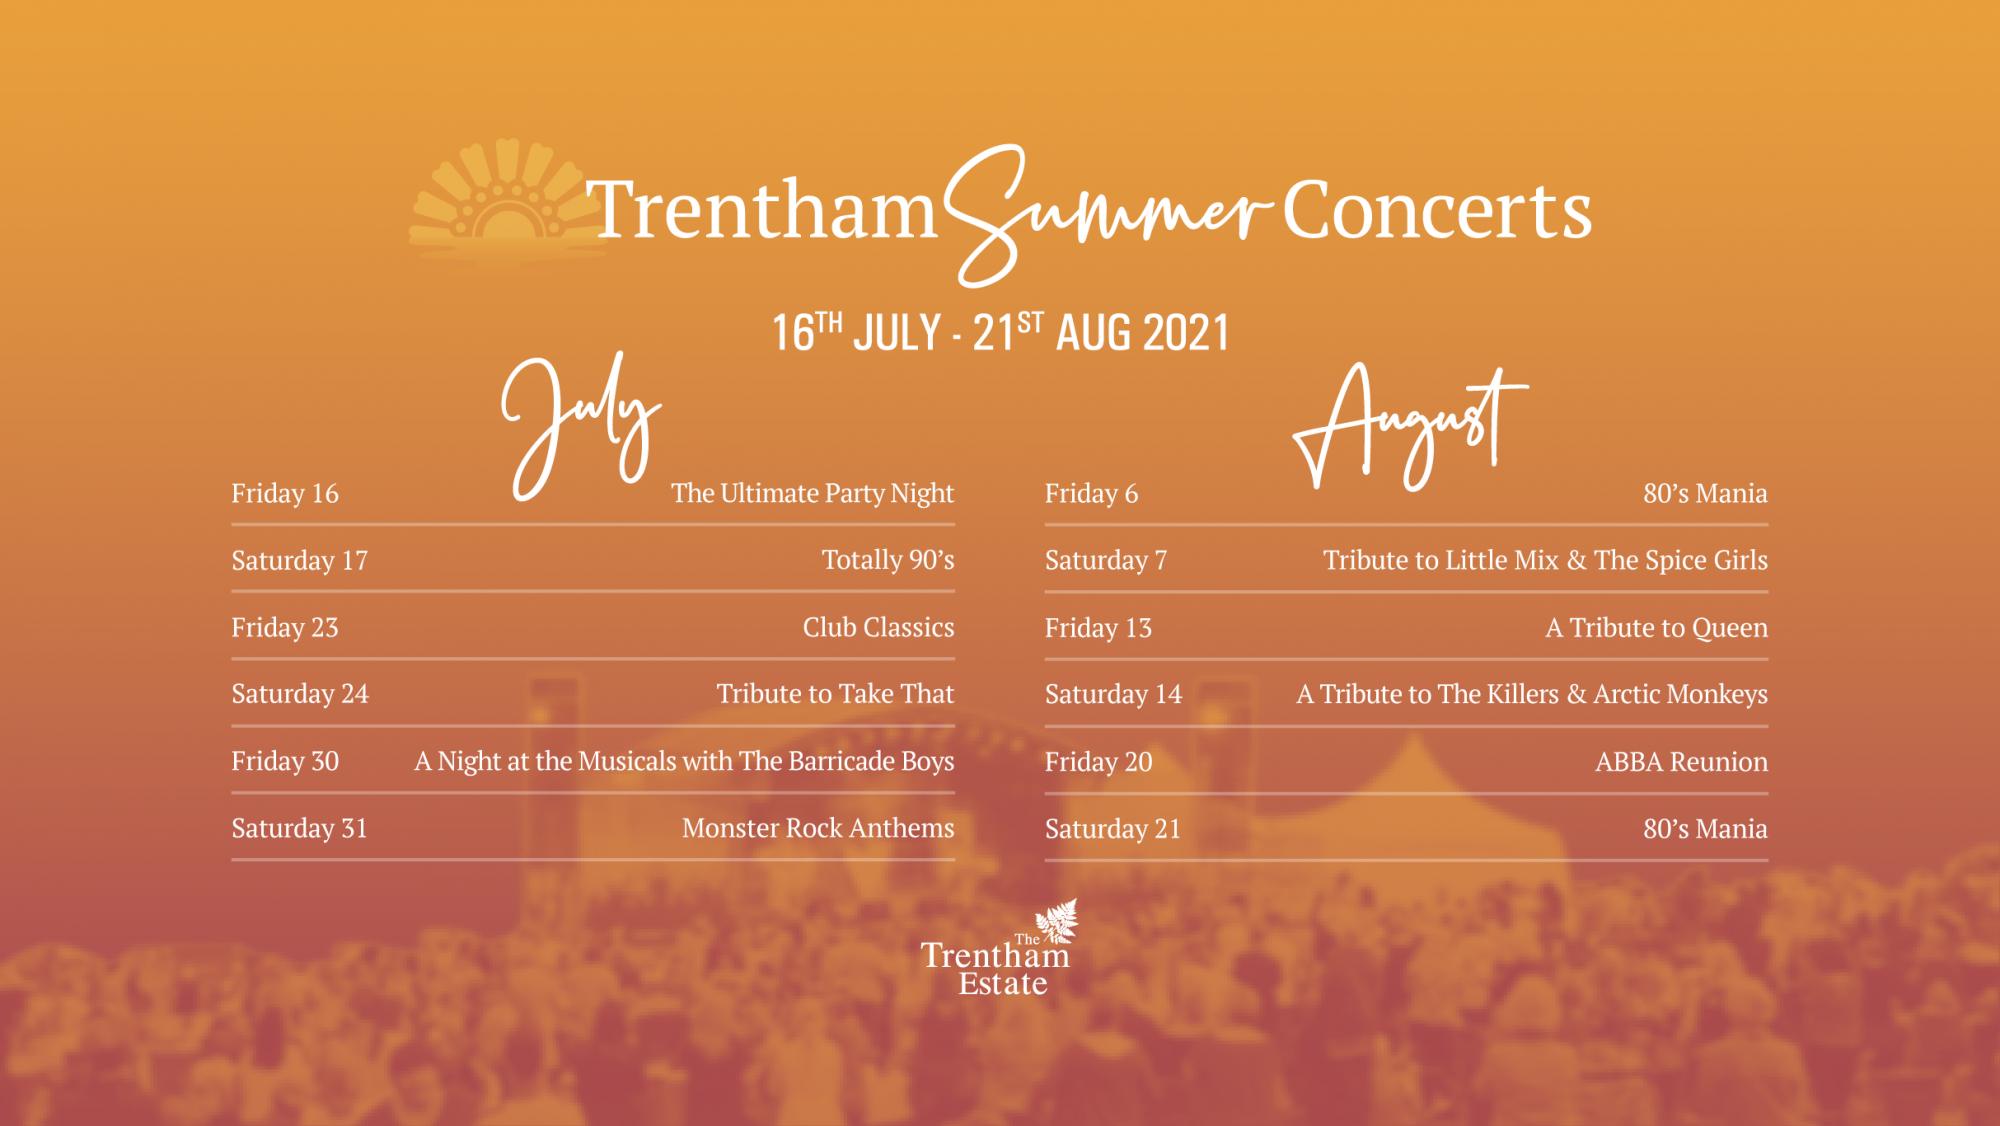 trentham summer concerts ticketmaster_main_2426x1365